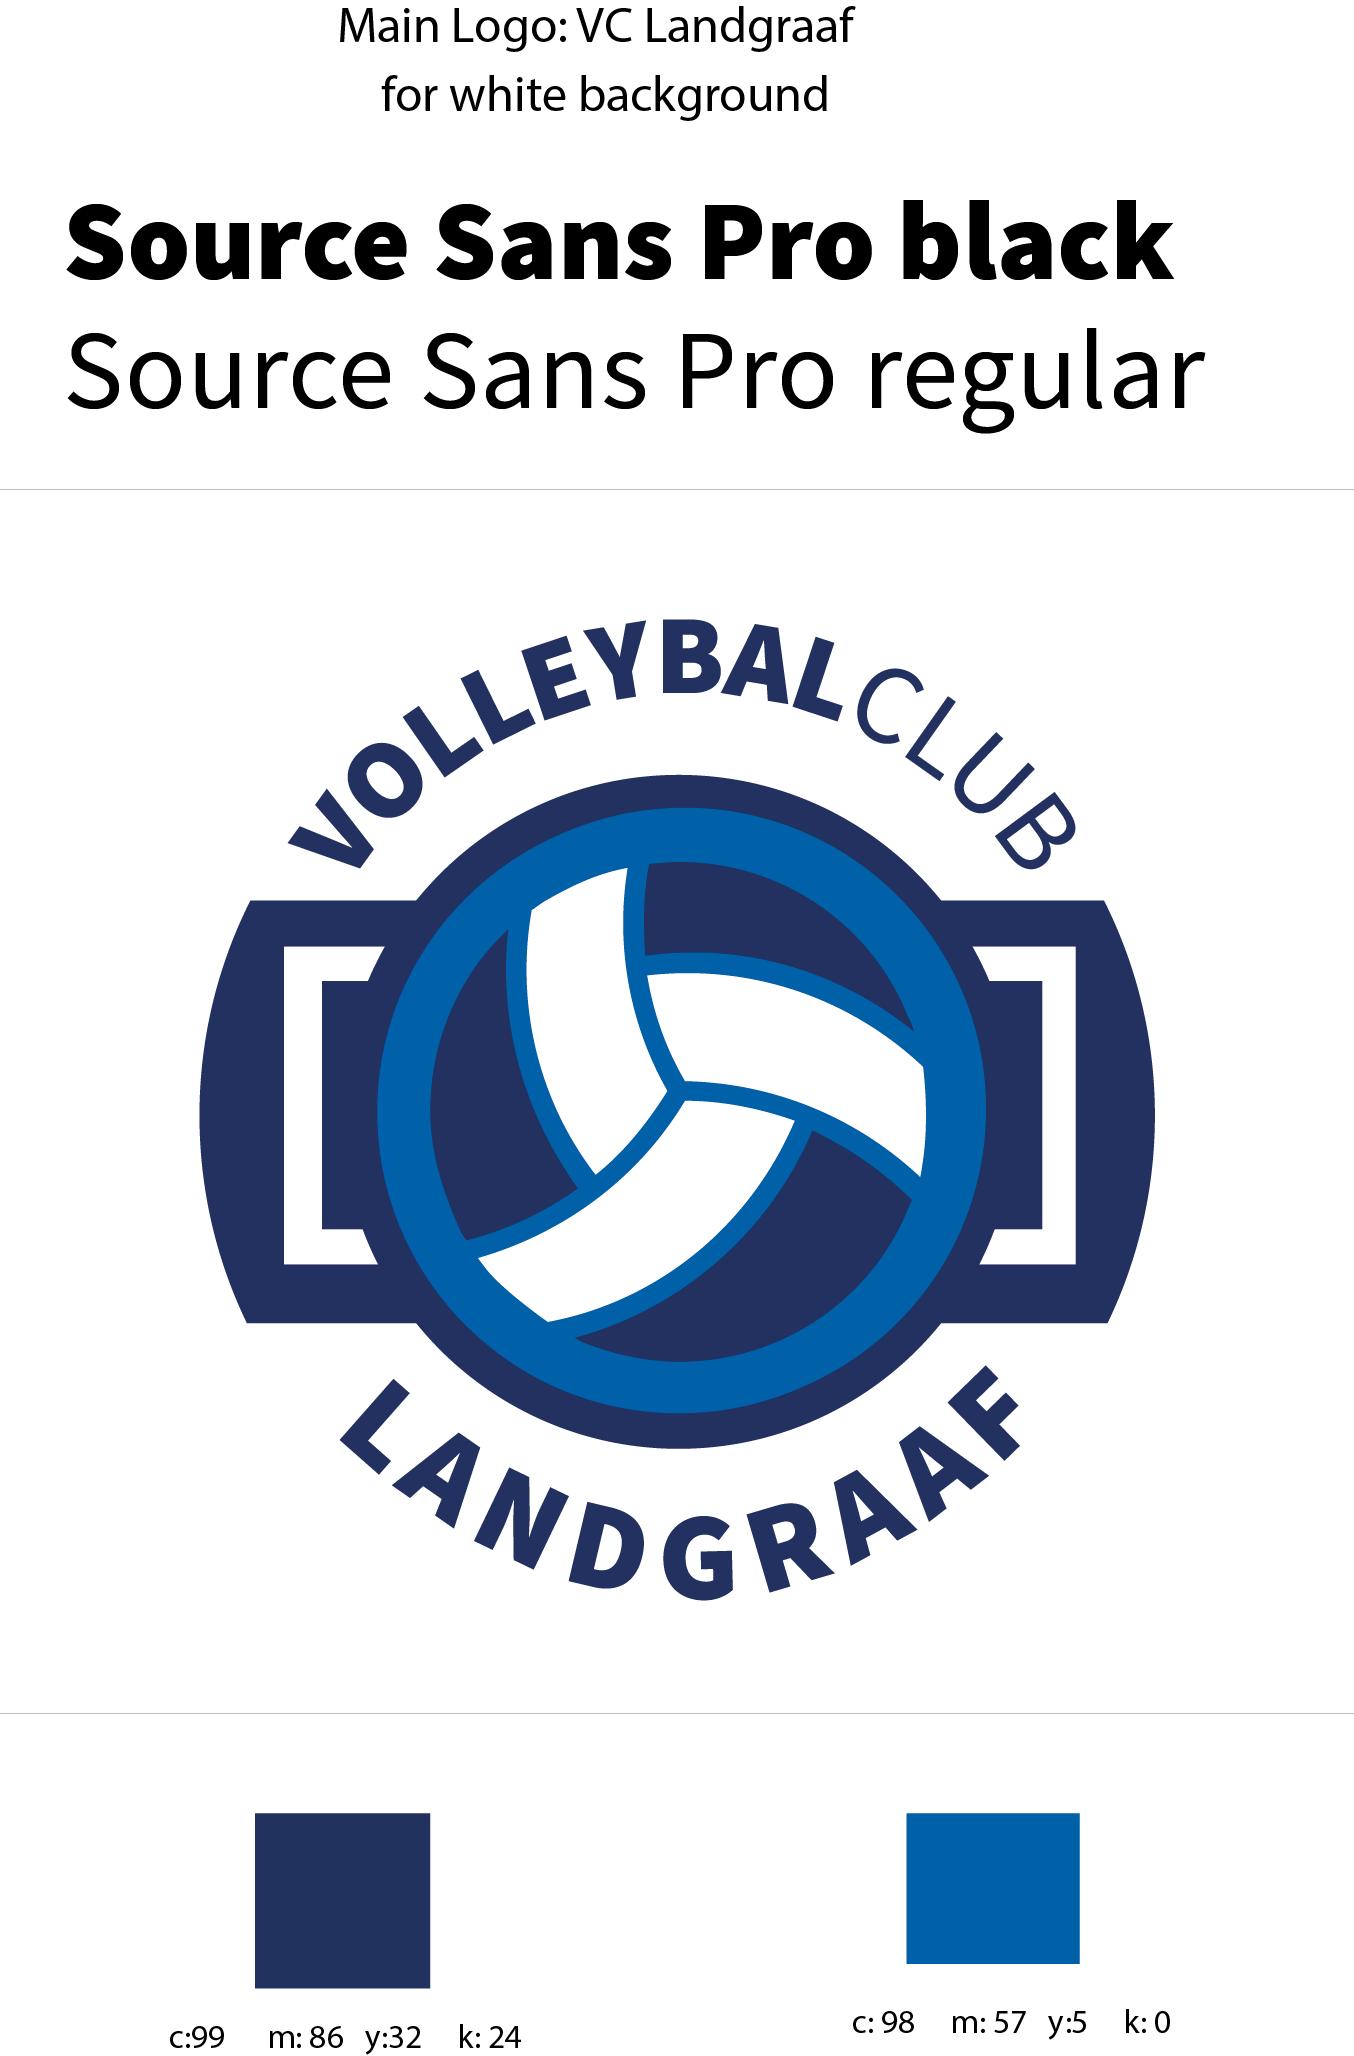 VCL_Logo_main